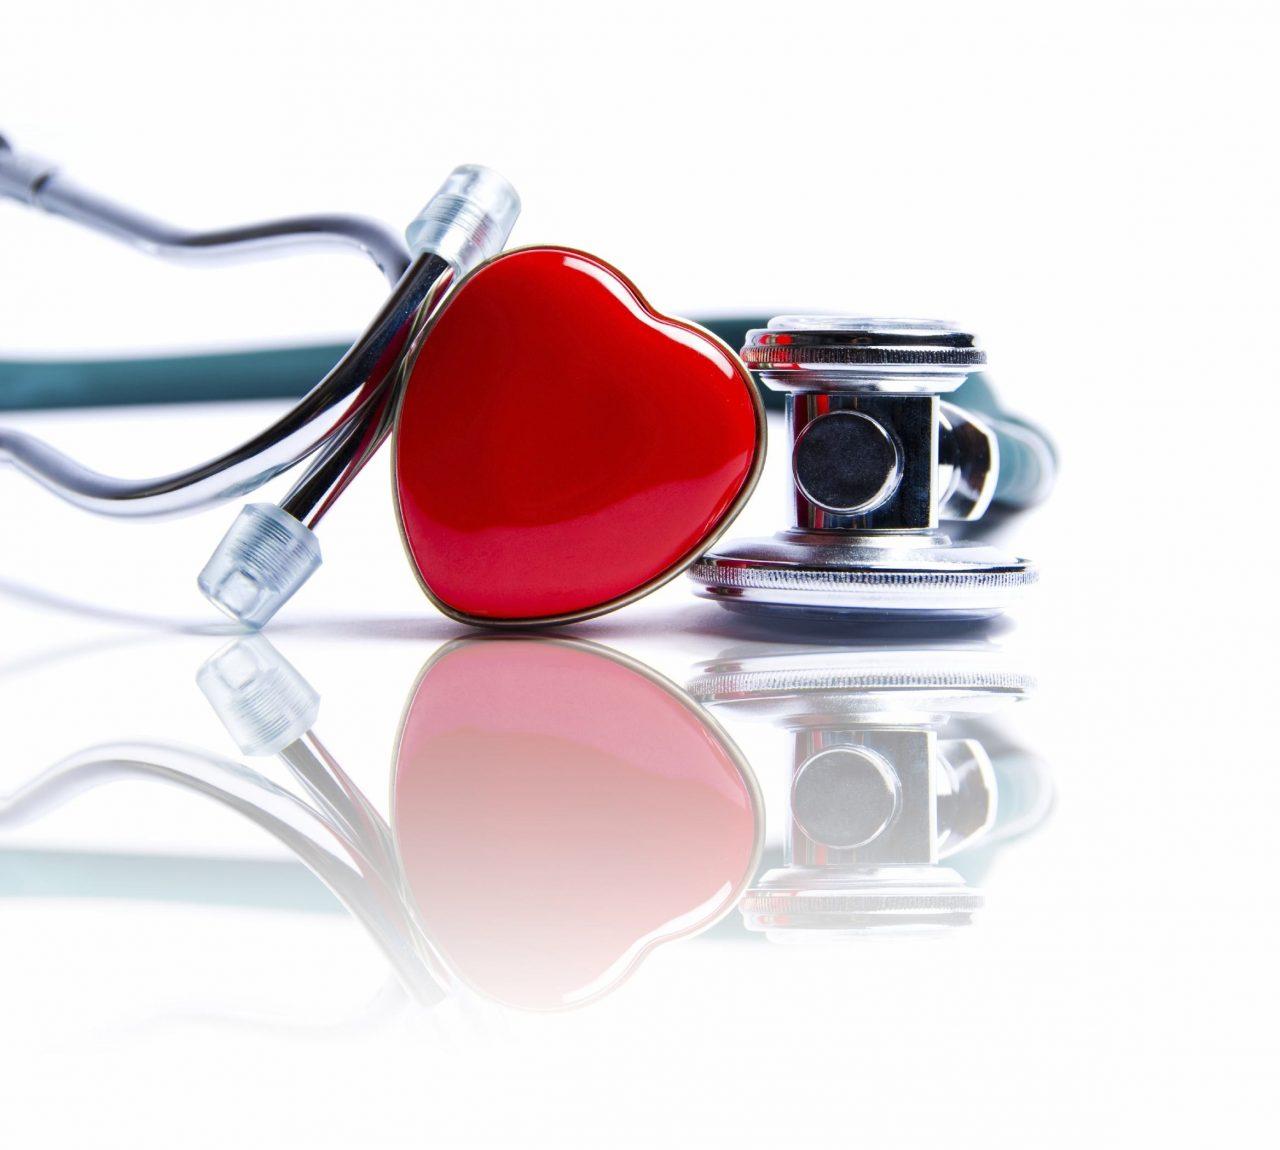 bright-cardiac-cardiology-433267-1280x1150.jpg